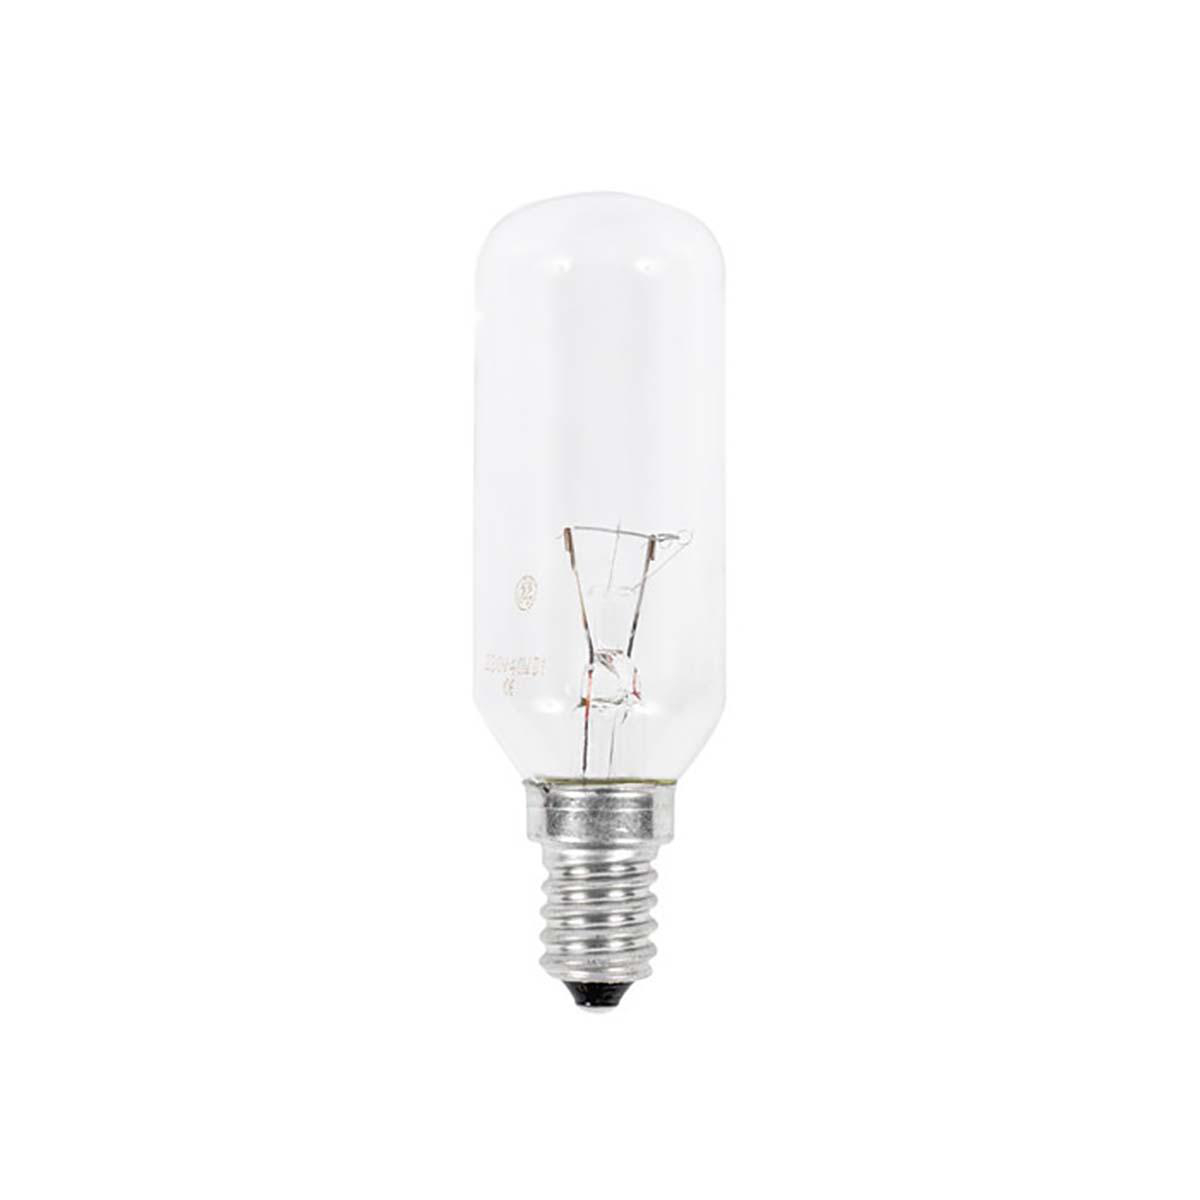 Backofenlampen E14 40 W Original-Teilenummer 50279890003